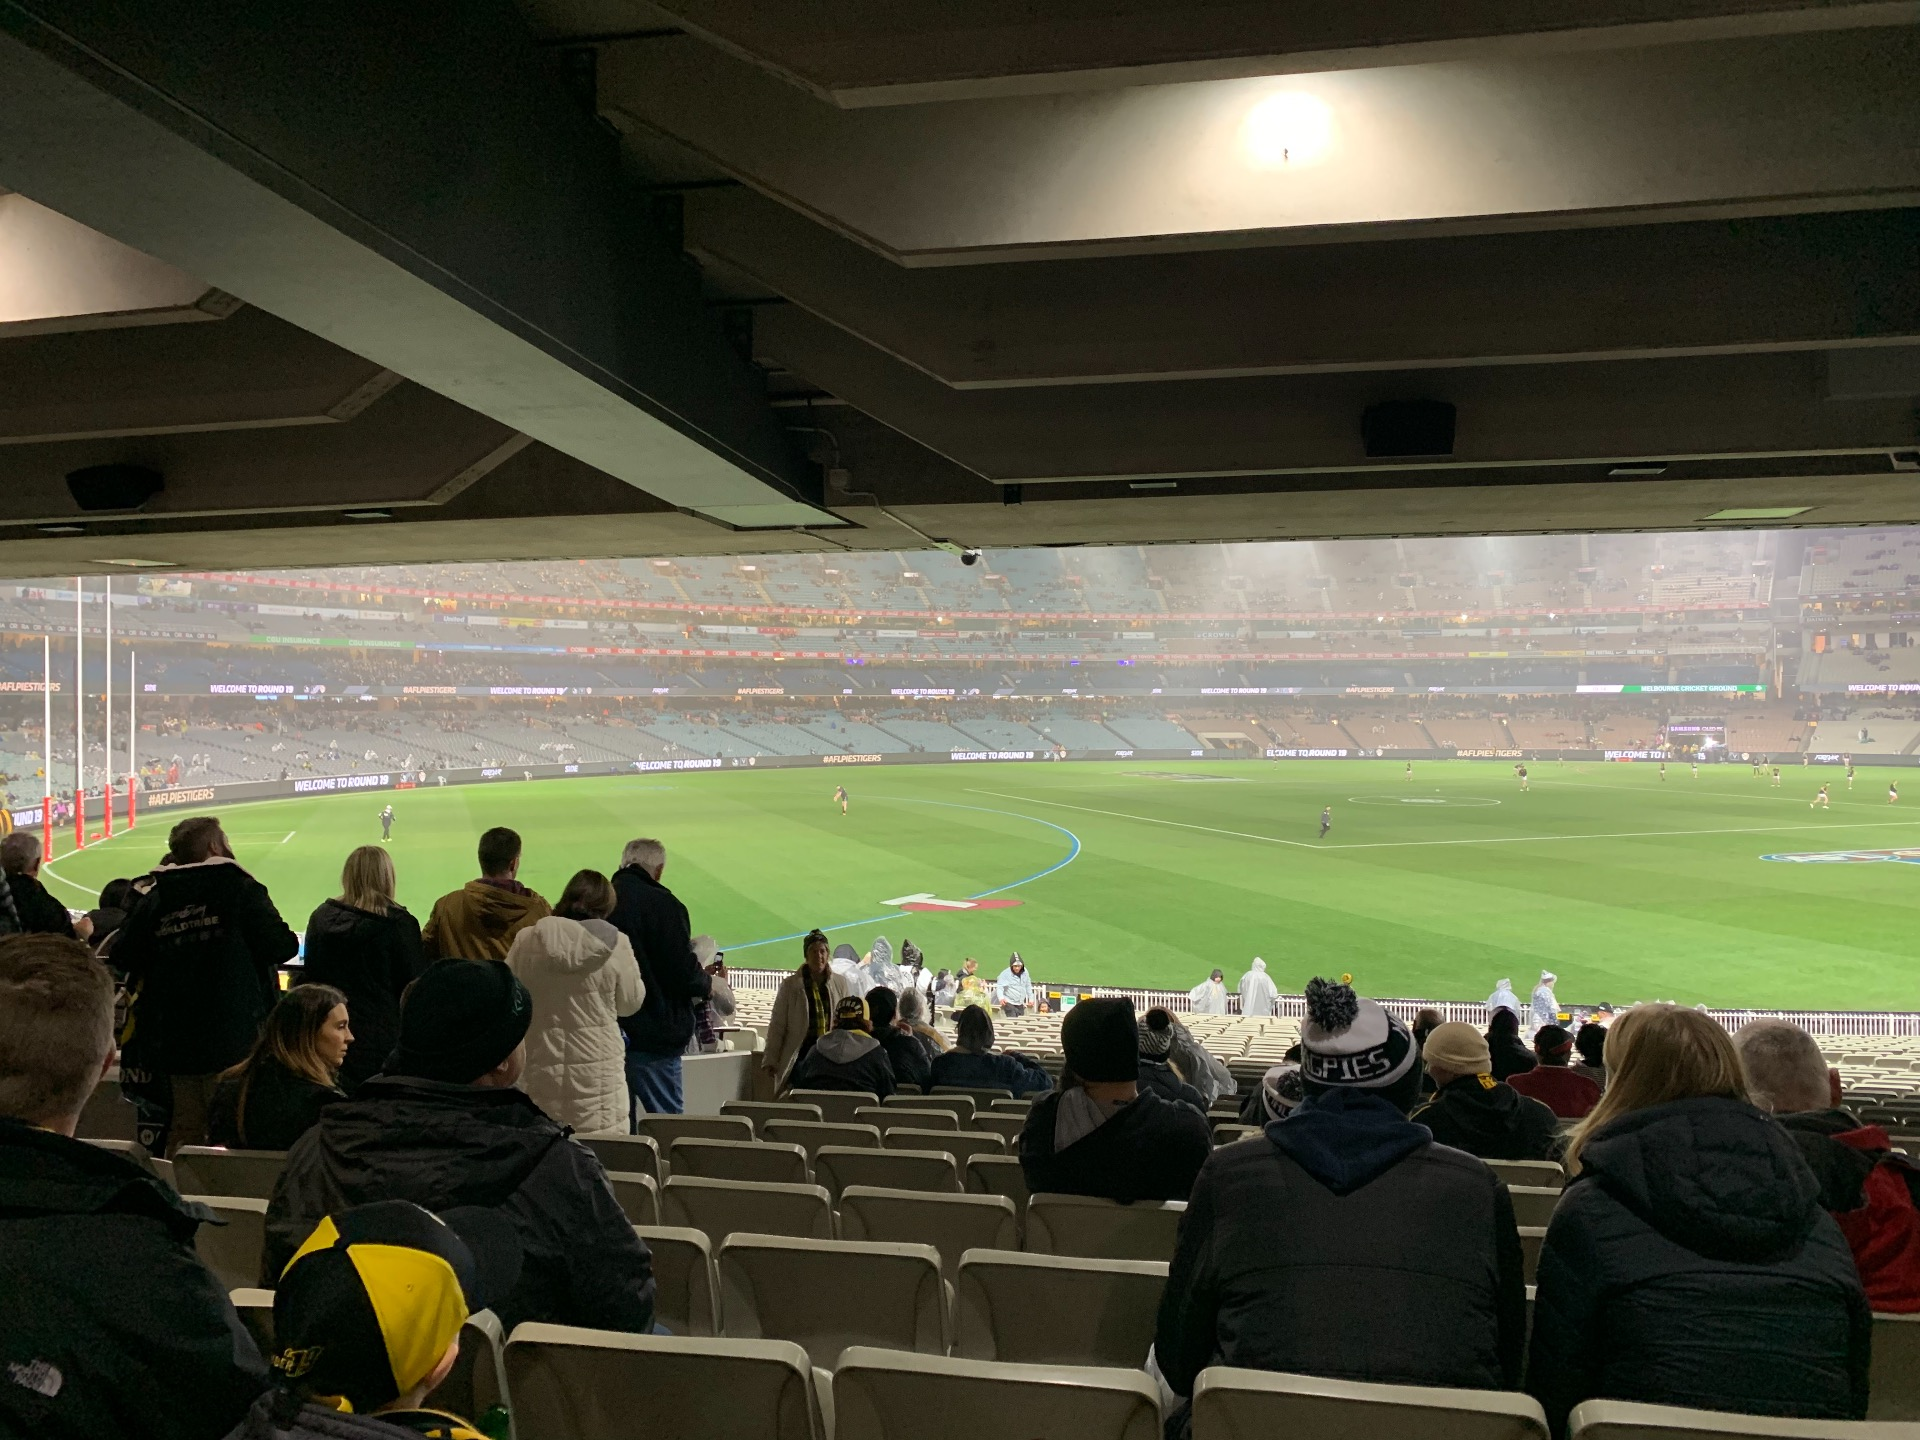 Melbourne Cricket Ground Section M42 Row Kk Seat 11